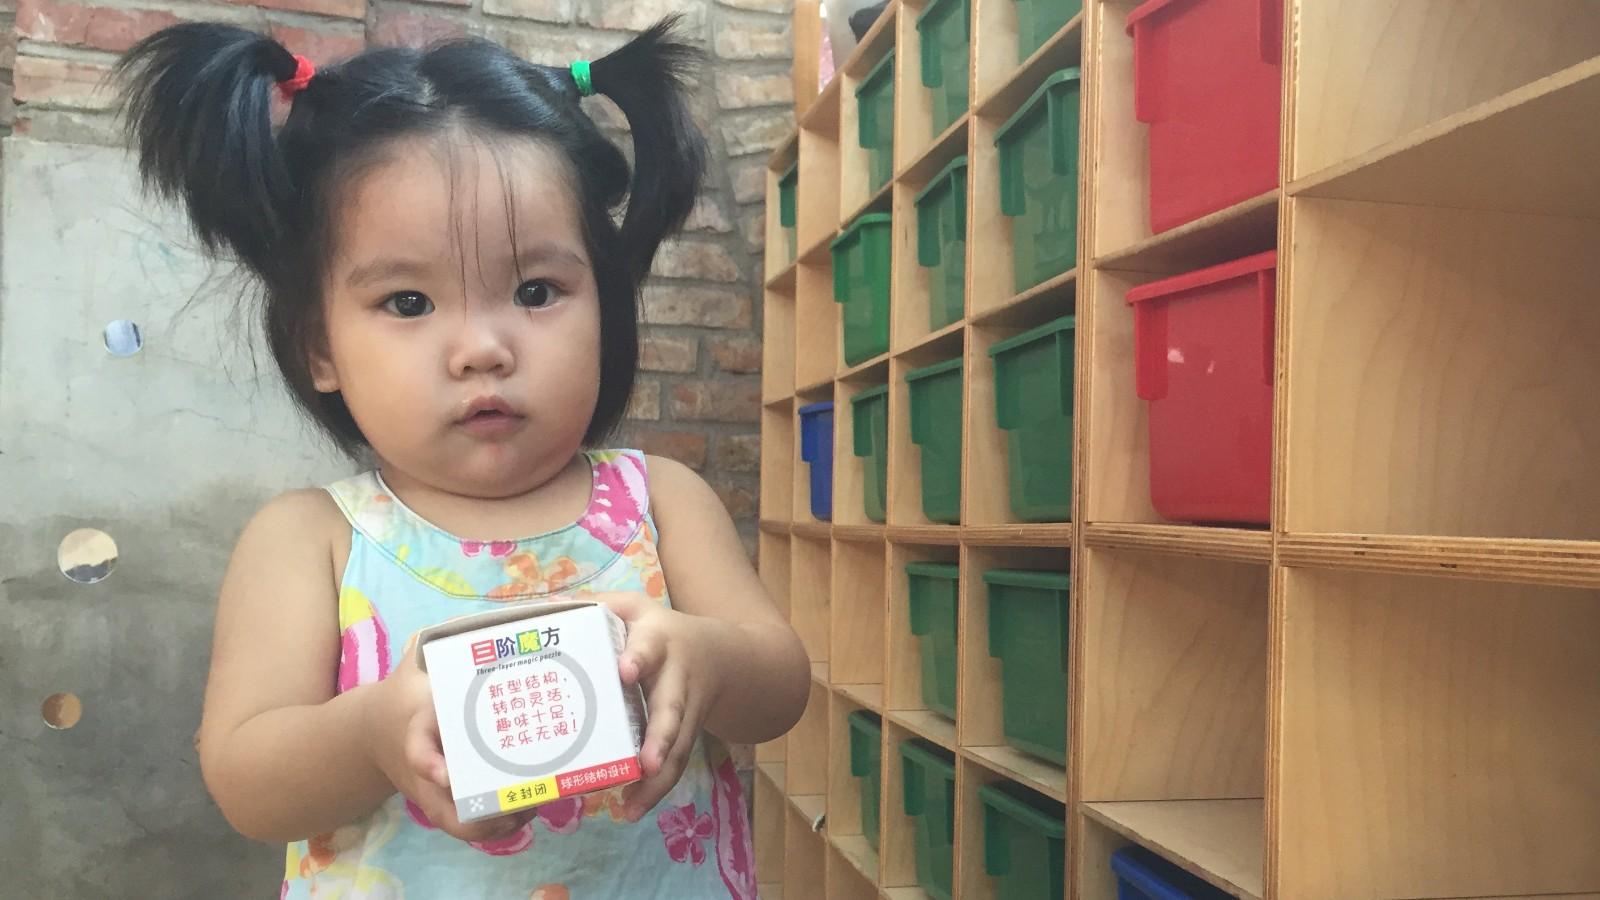 International adoption Photolisting, Waiting Child Adoption Program Chinese children for adoption pictures